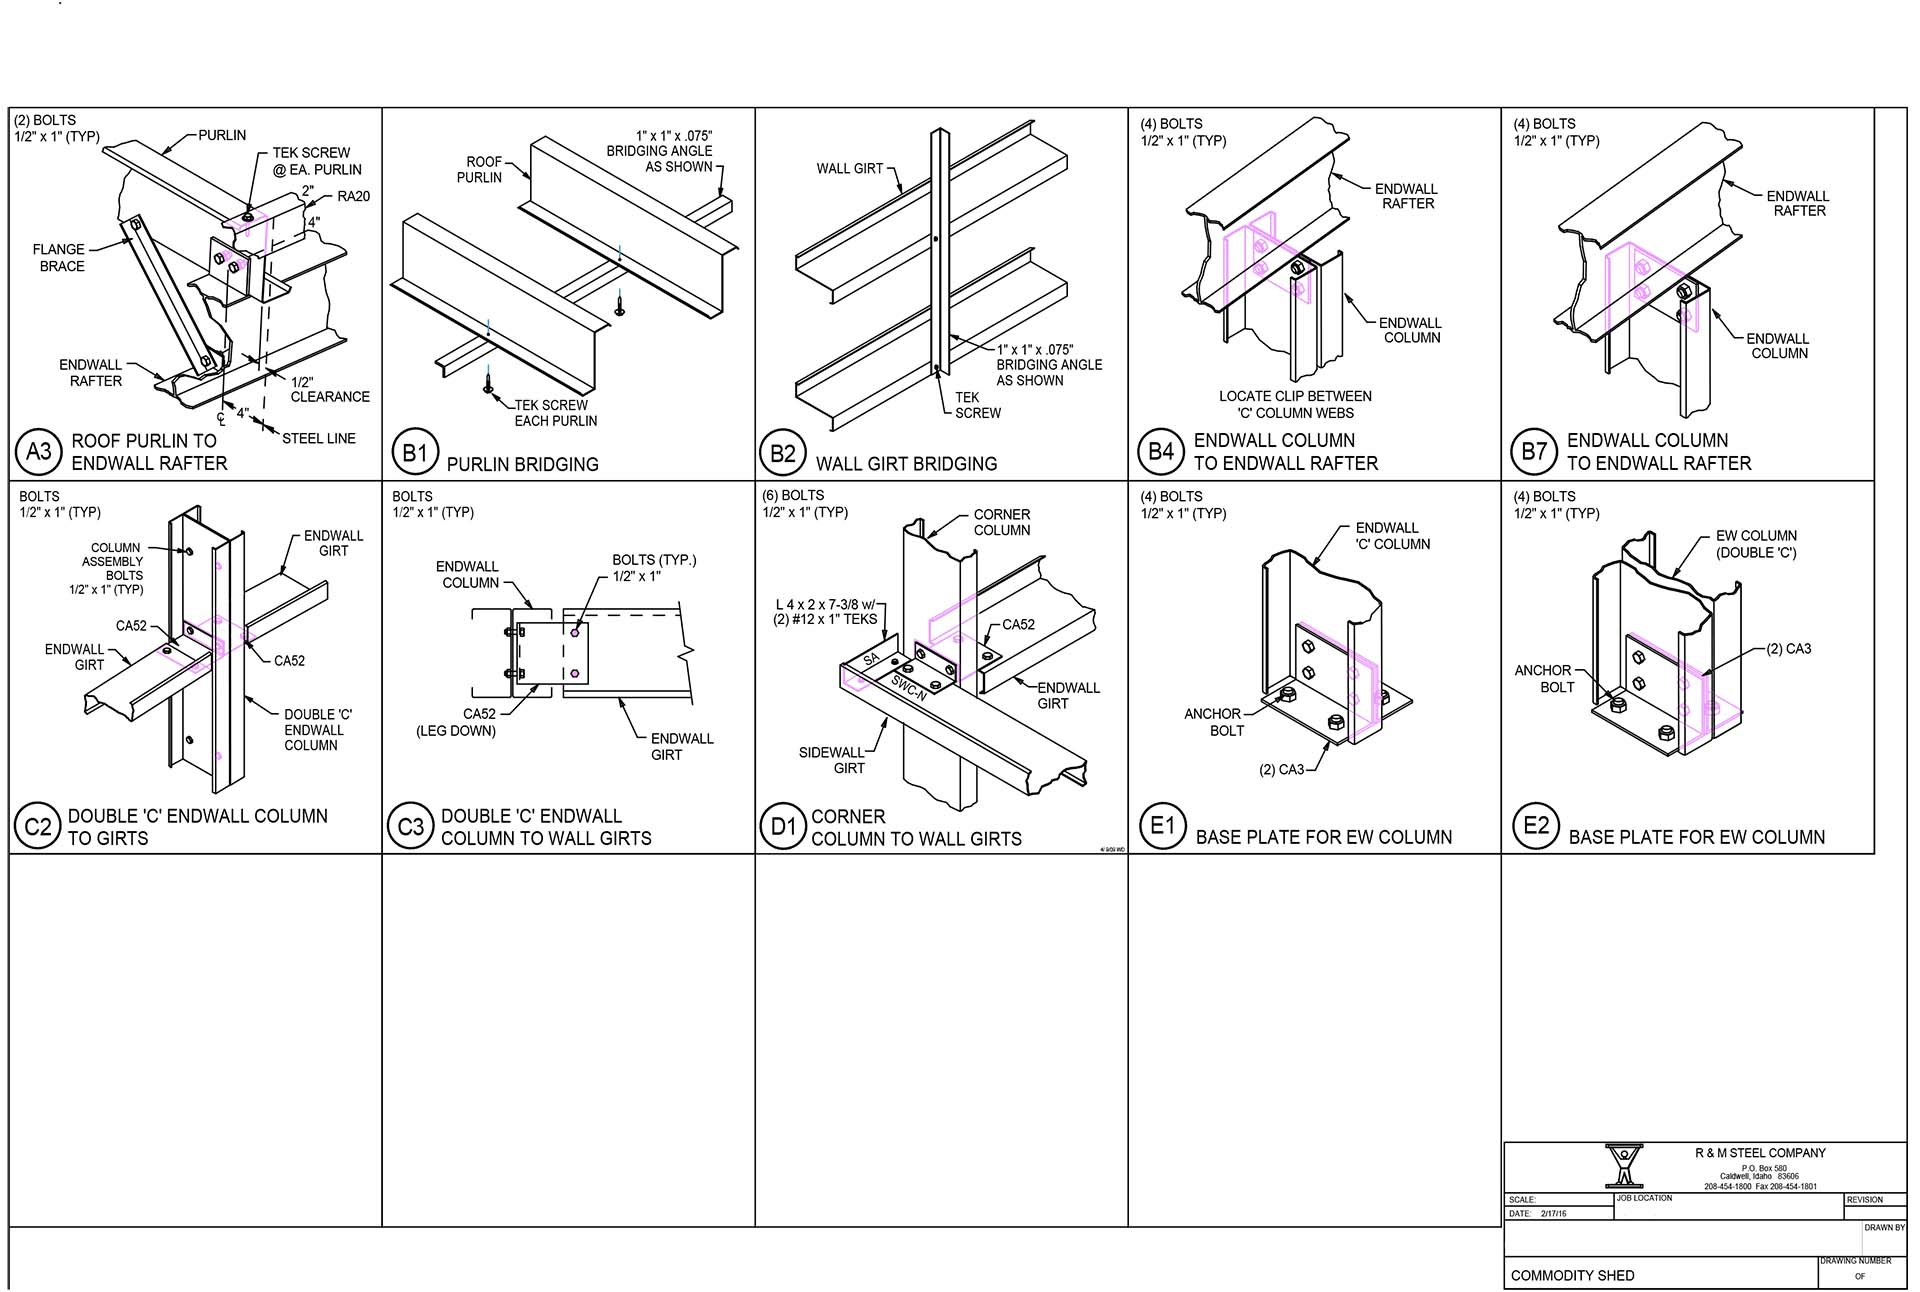 \\steel2017a\Drawings\DRAWINGS\2016\02\FA126126\11-Dtls-1.FC7